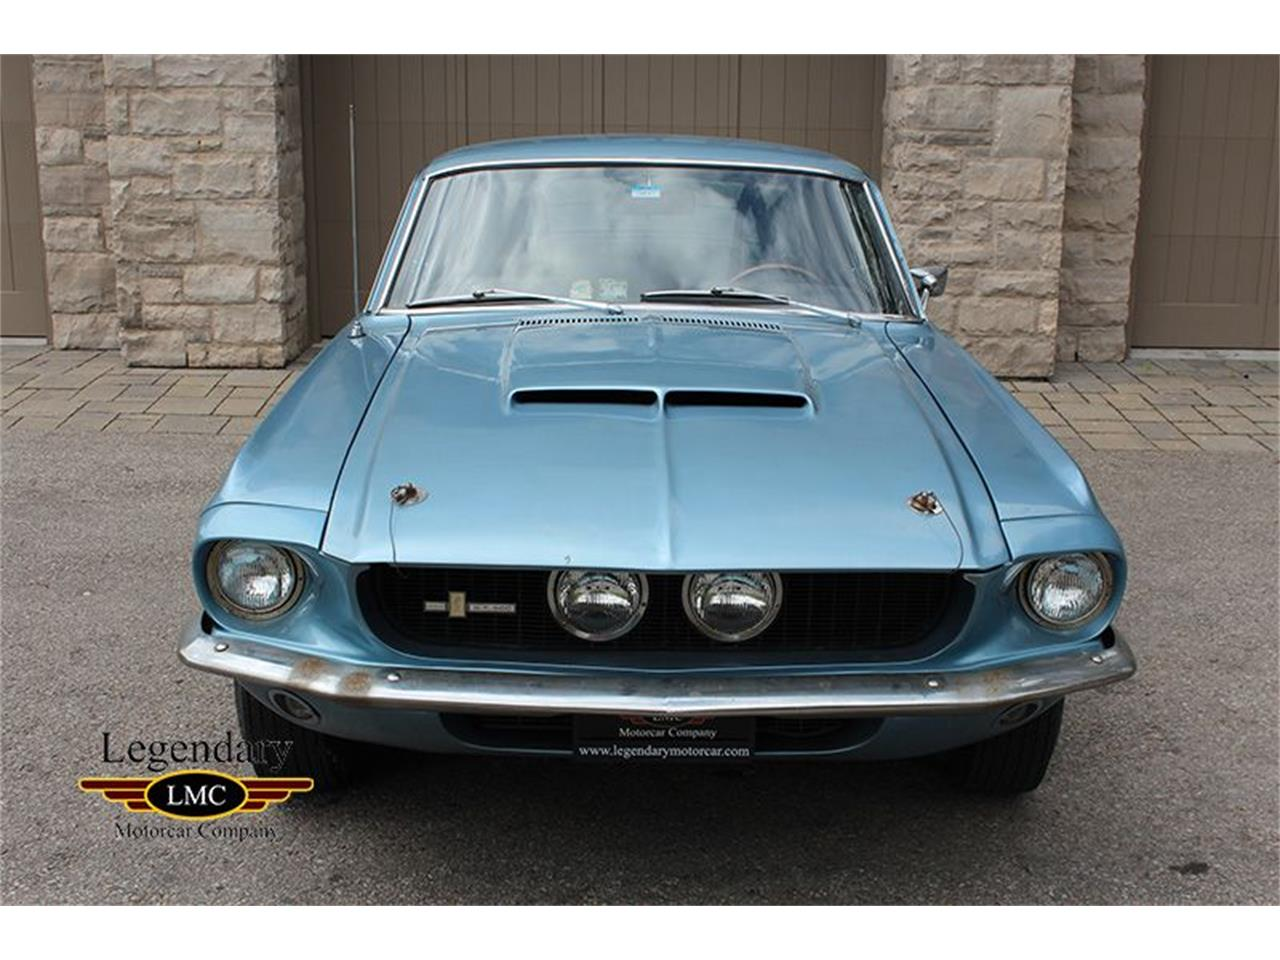 Large Picture of Classic '67 GT500 located in Halton Hills Ontario - $195,000.00 - ITZU